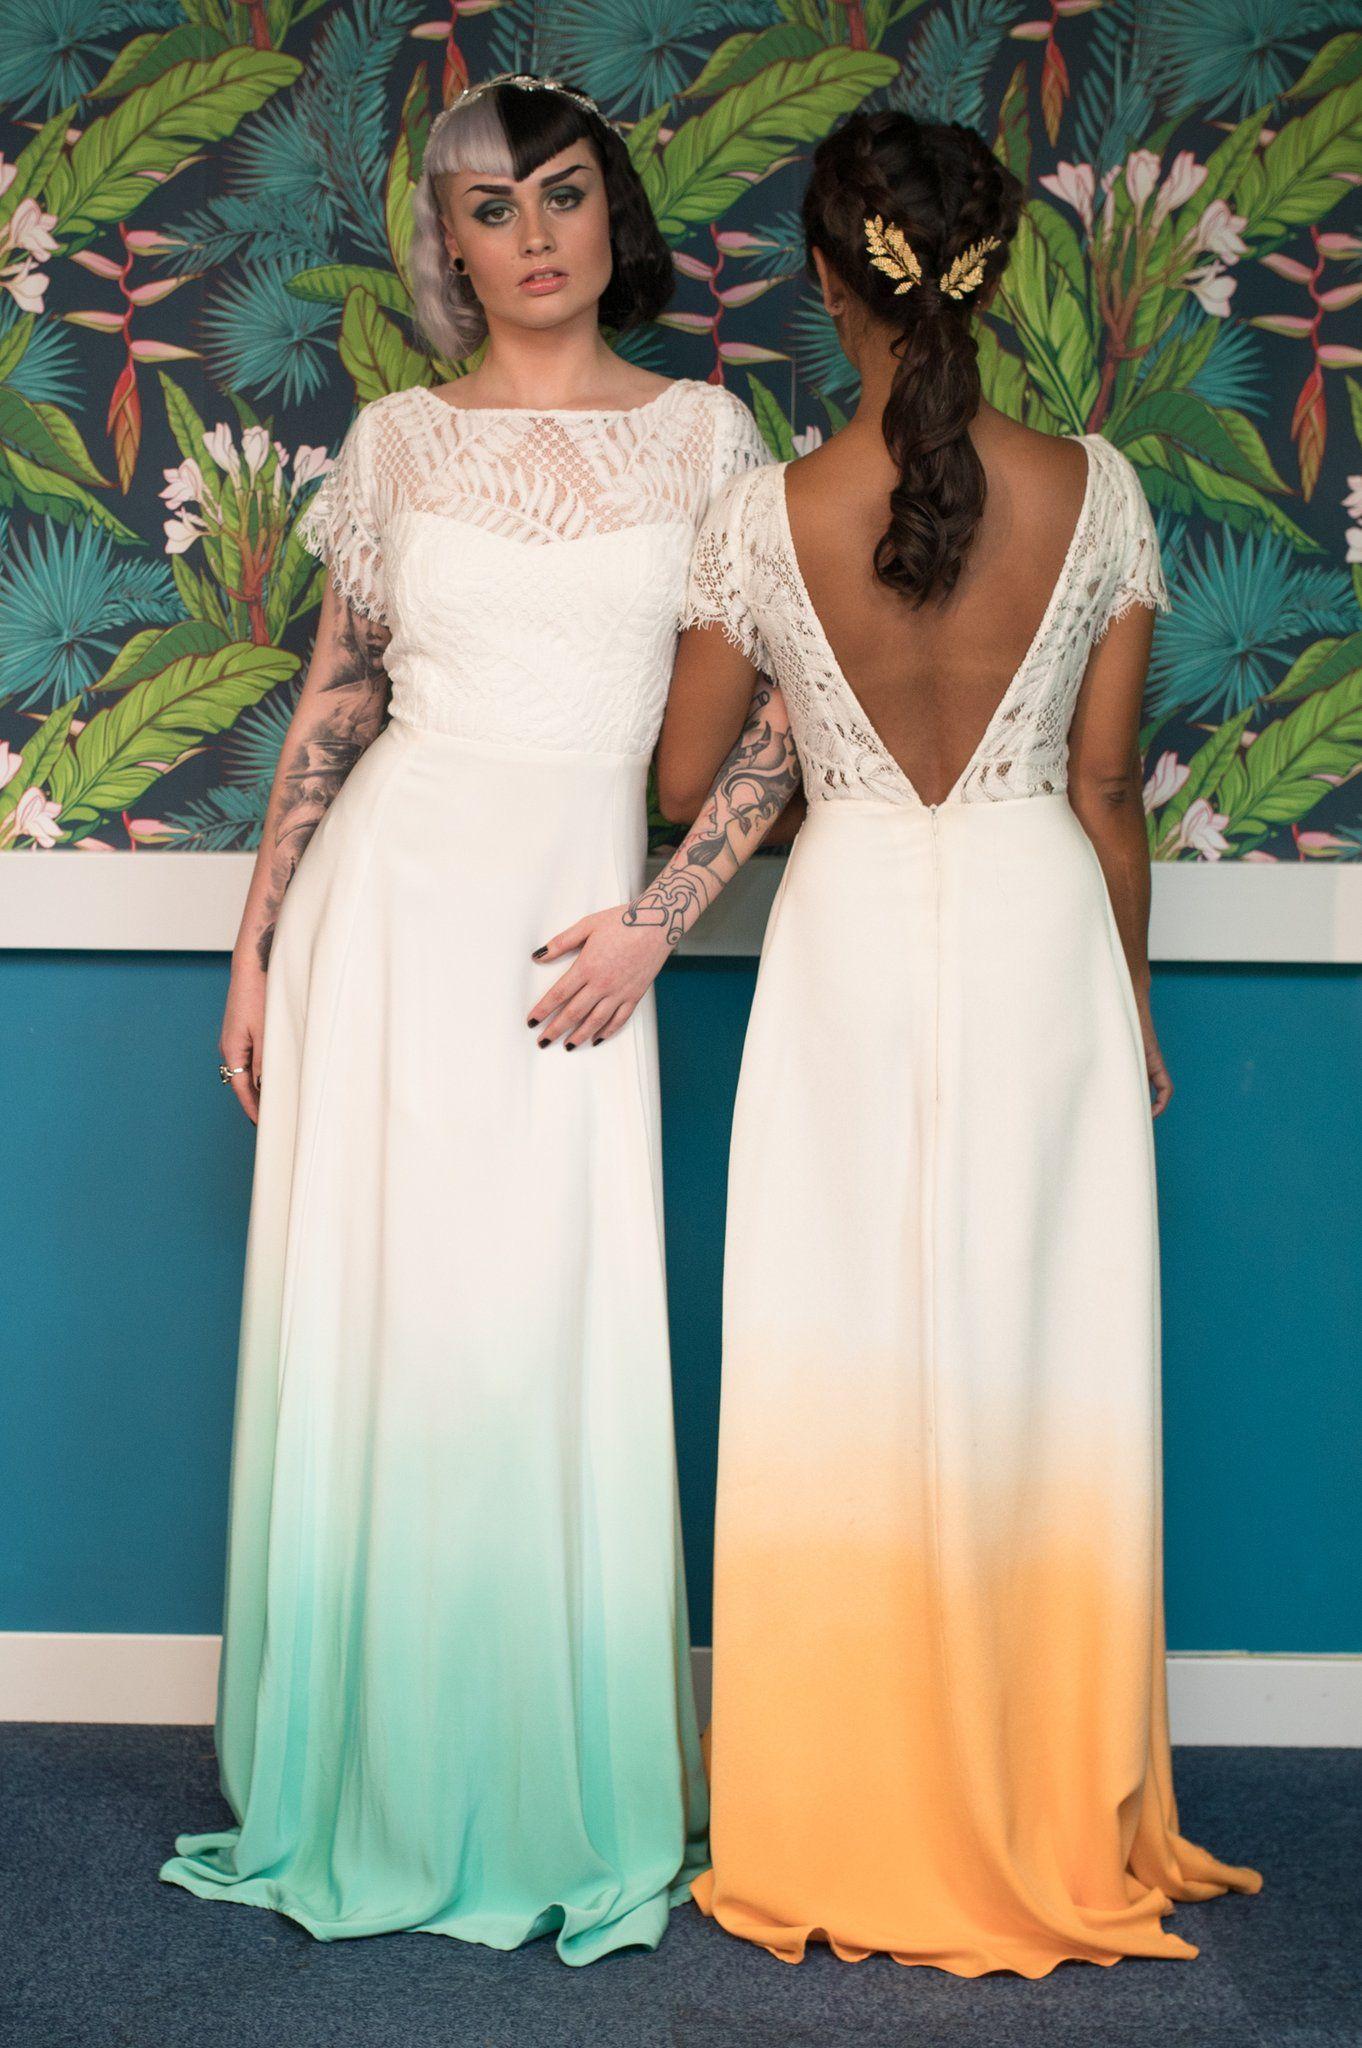 Pin by Lauren Mirelli on wedding dresses | Pinterest | Dip dye ...